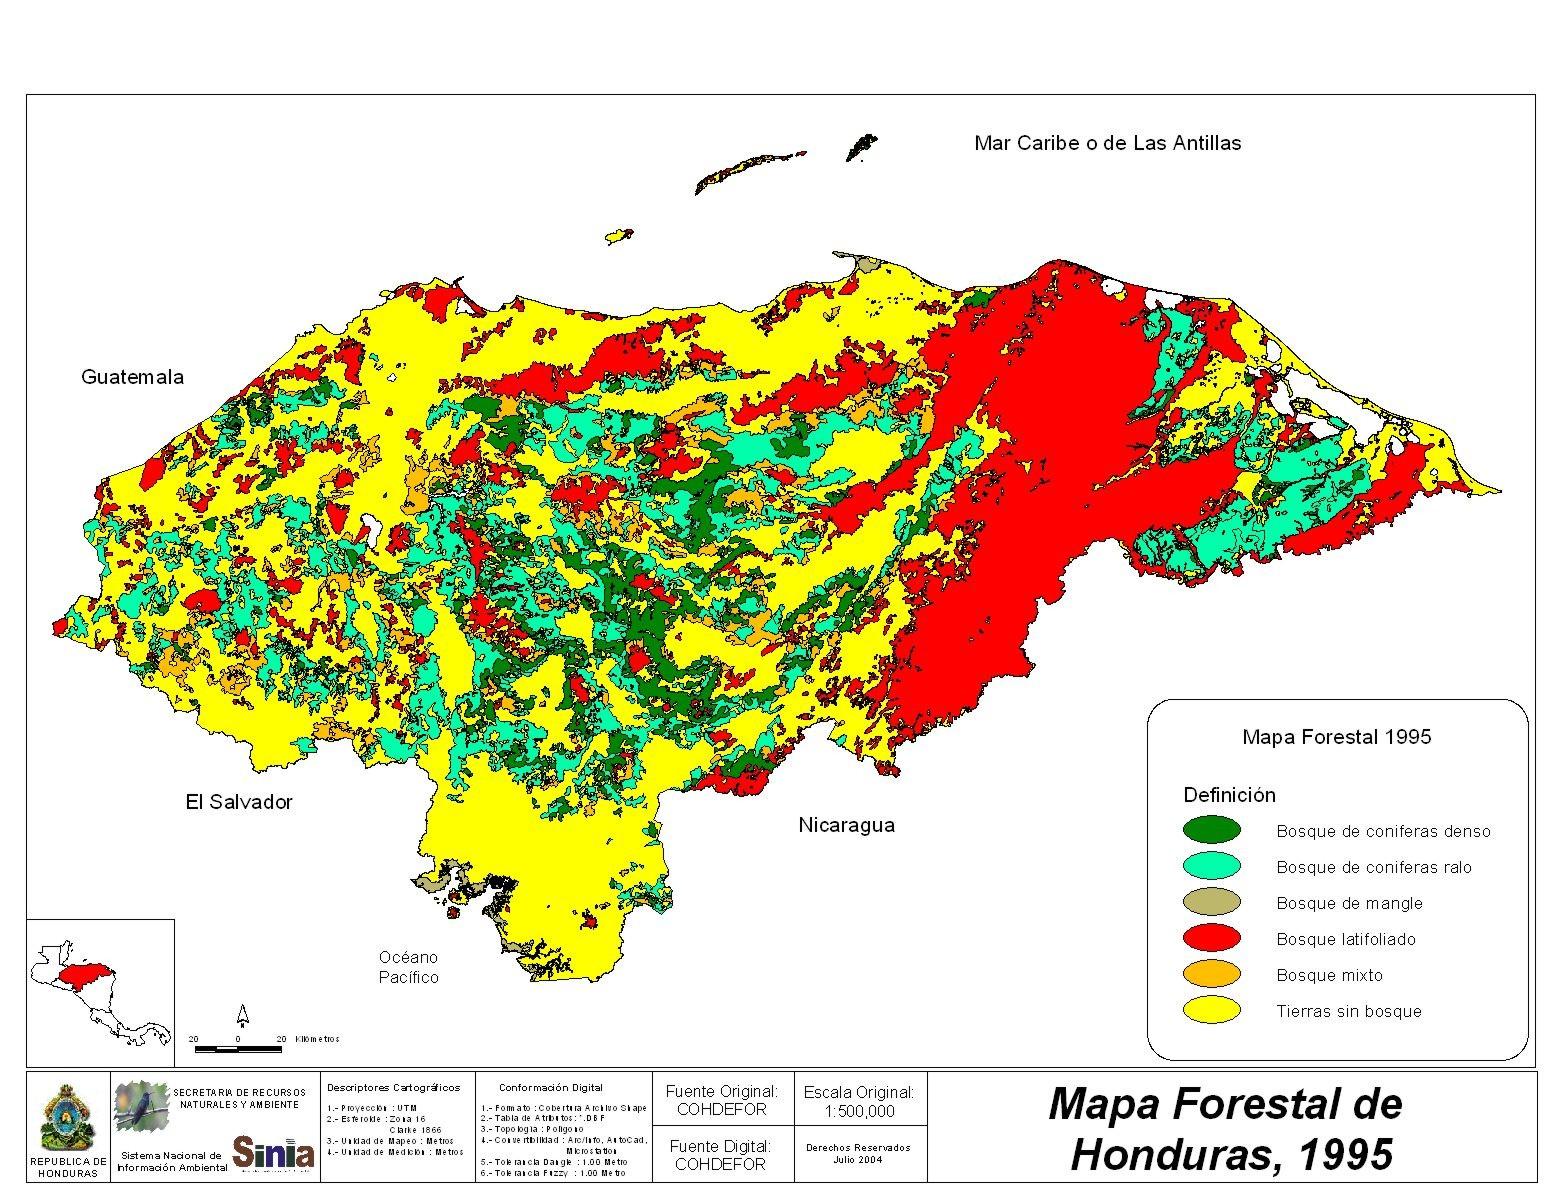 Mapa Forestal de Honduras